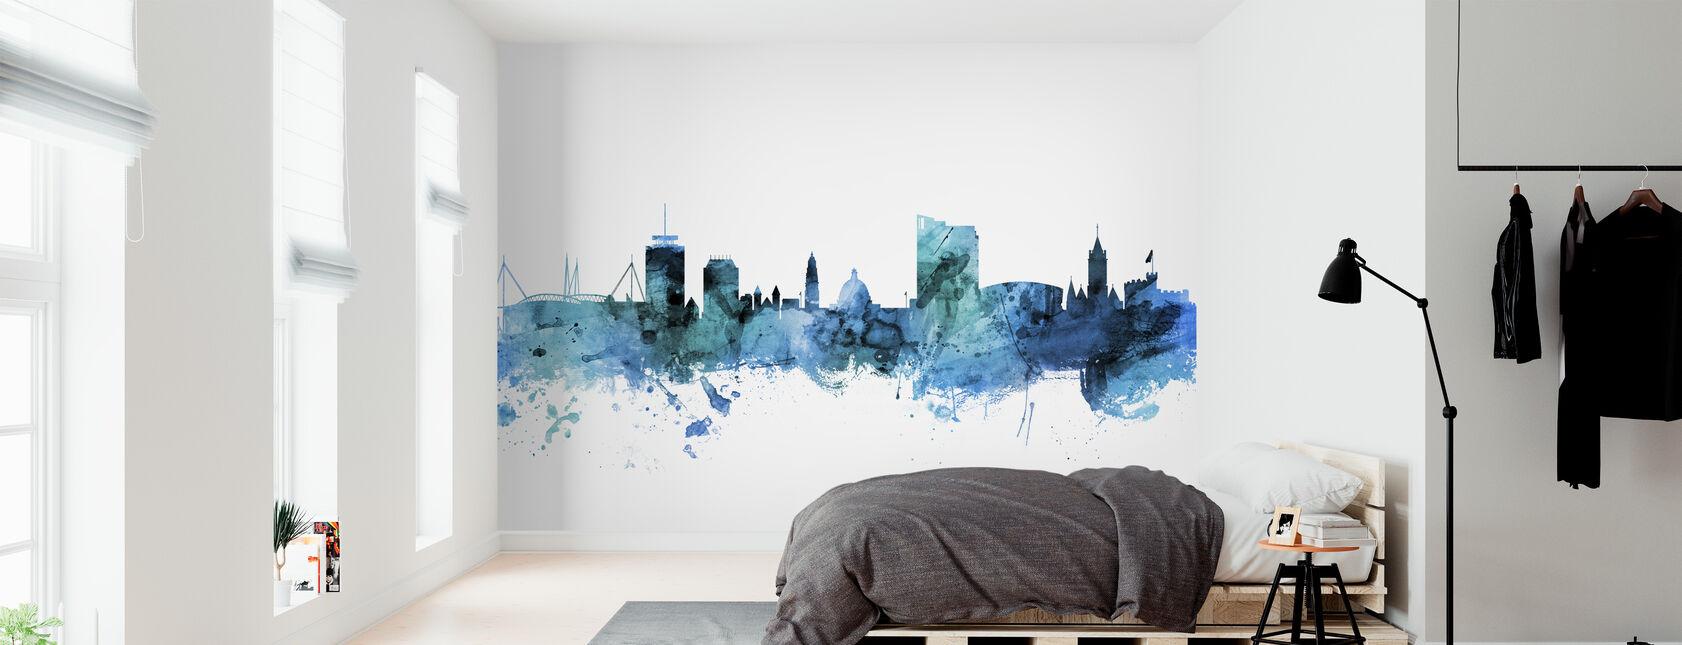 Cardiff Wales Skyline - Wallpaper - Bedroom